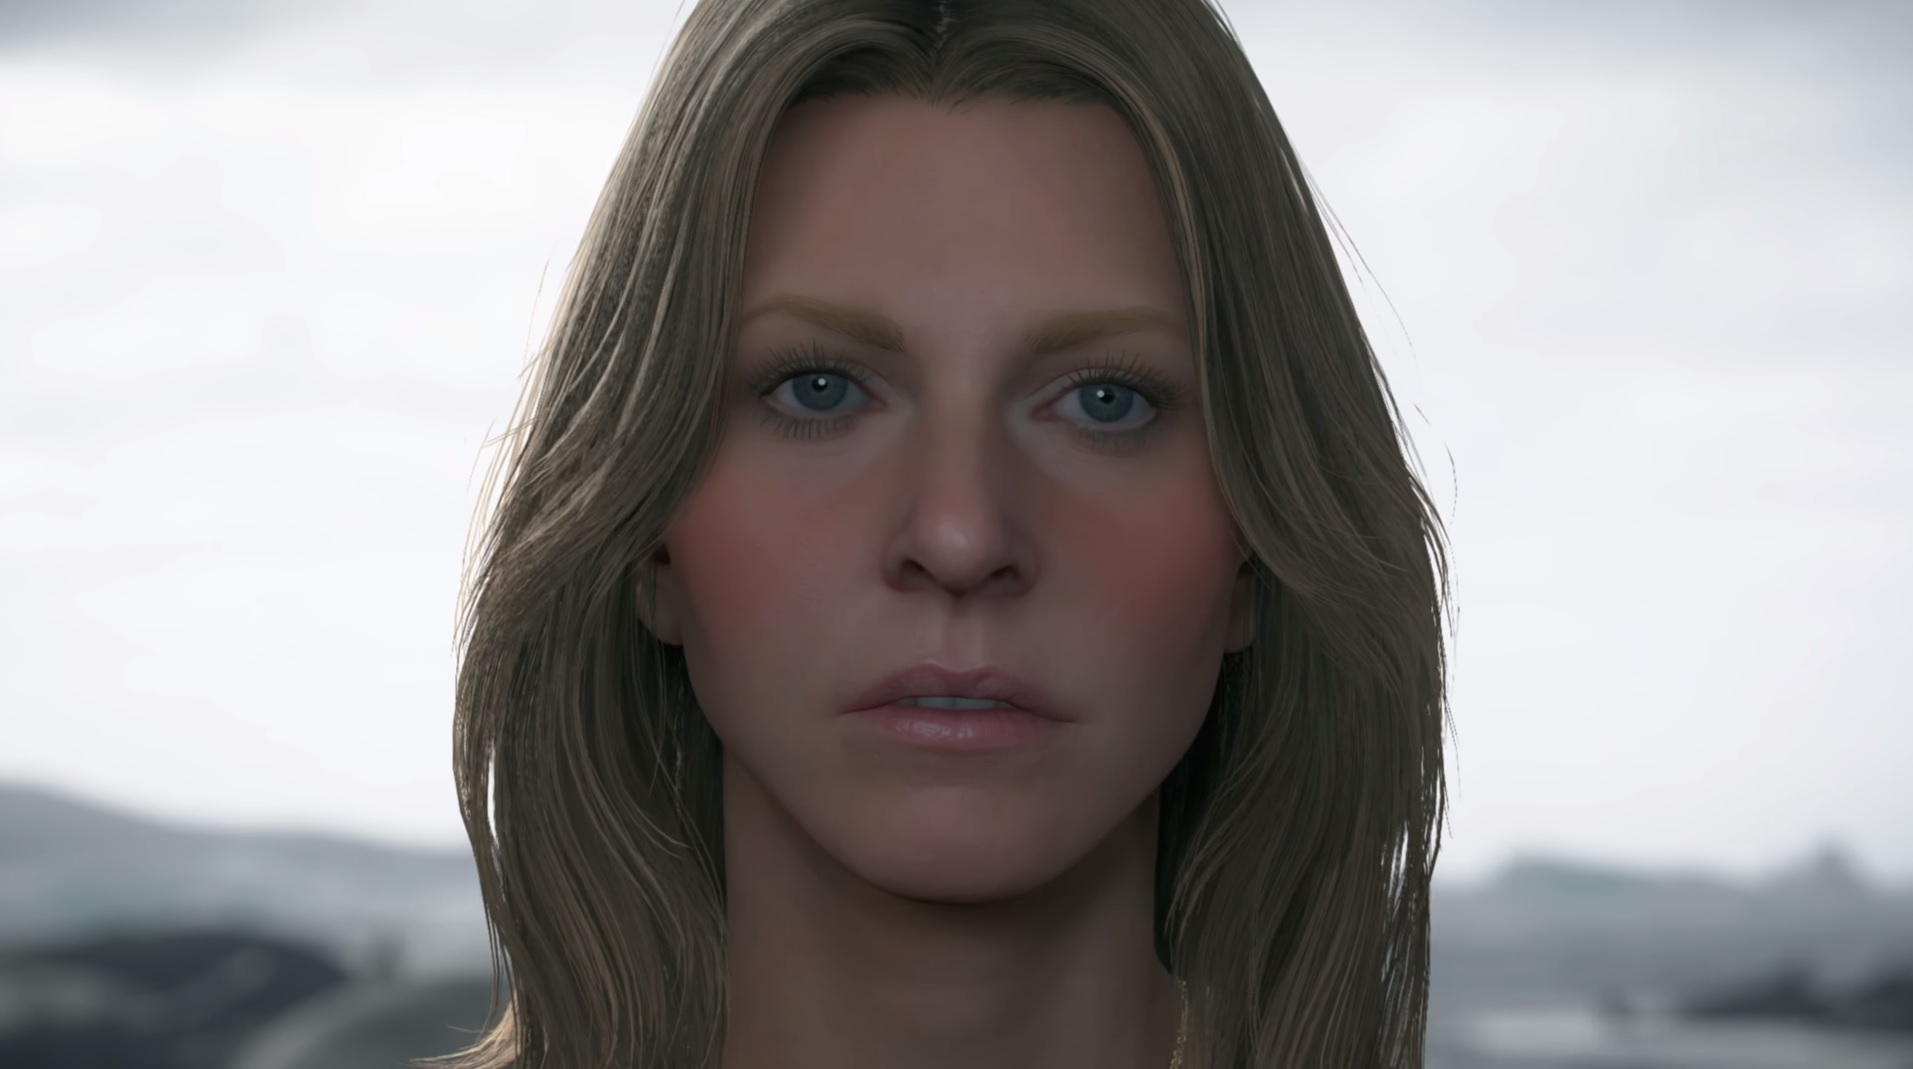 Death Stranding gameplay videos